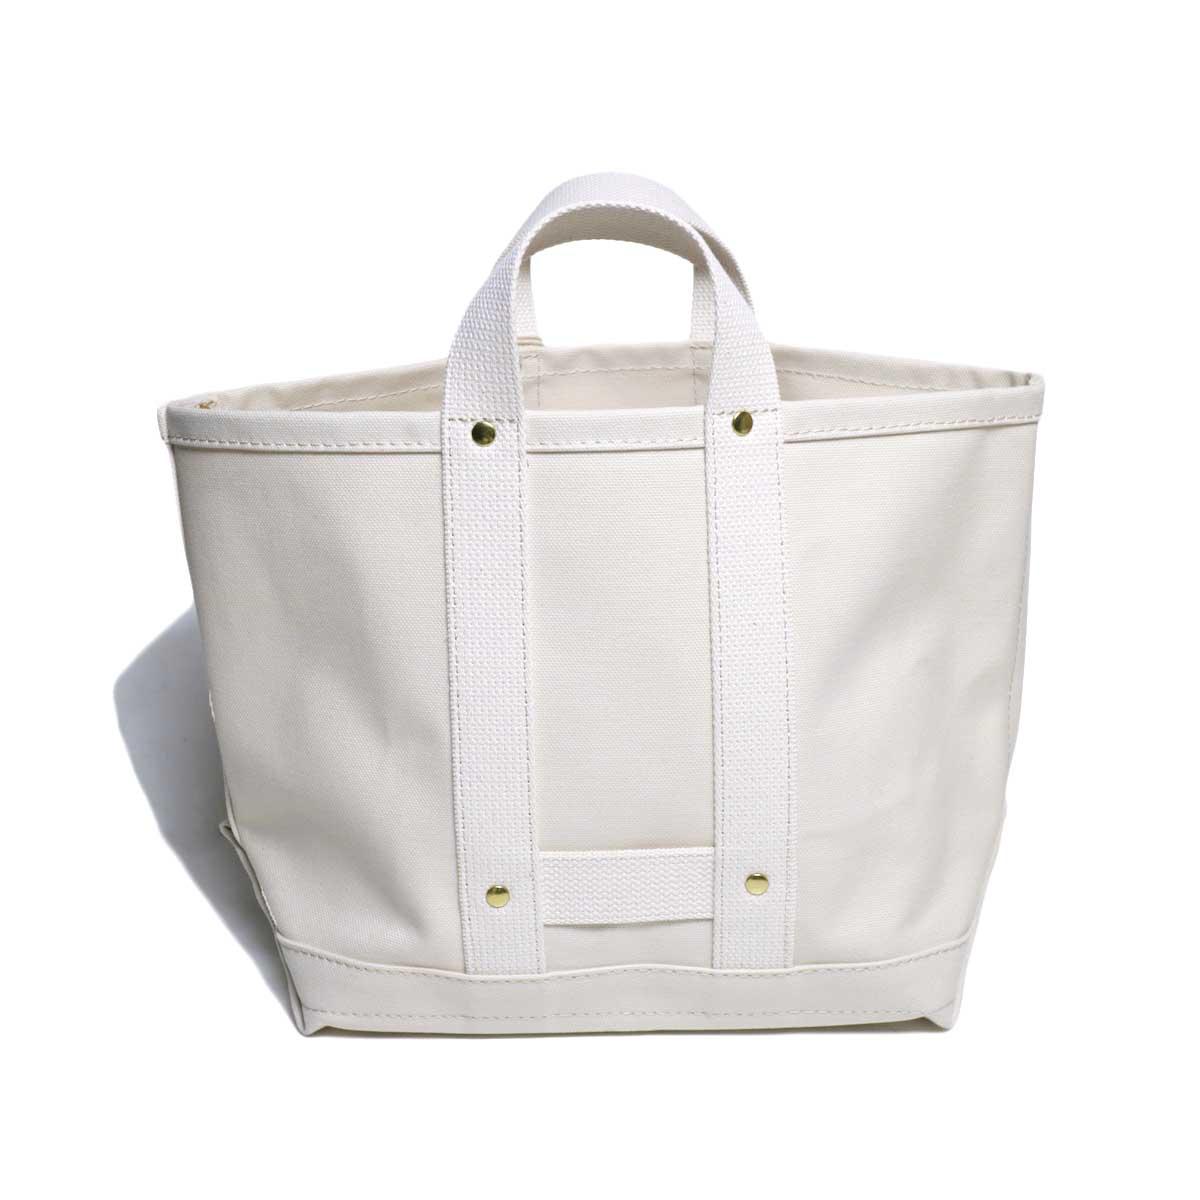 MASTER & Co. / RAILMAN BAG (White S)